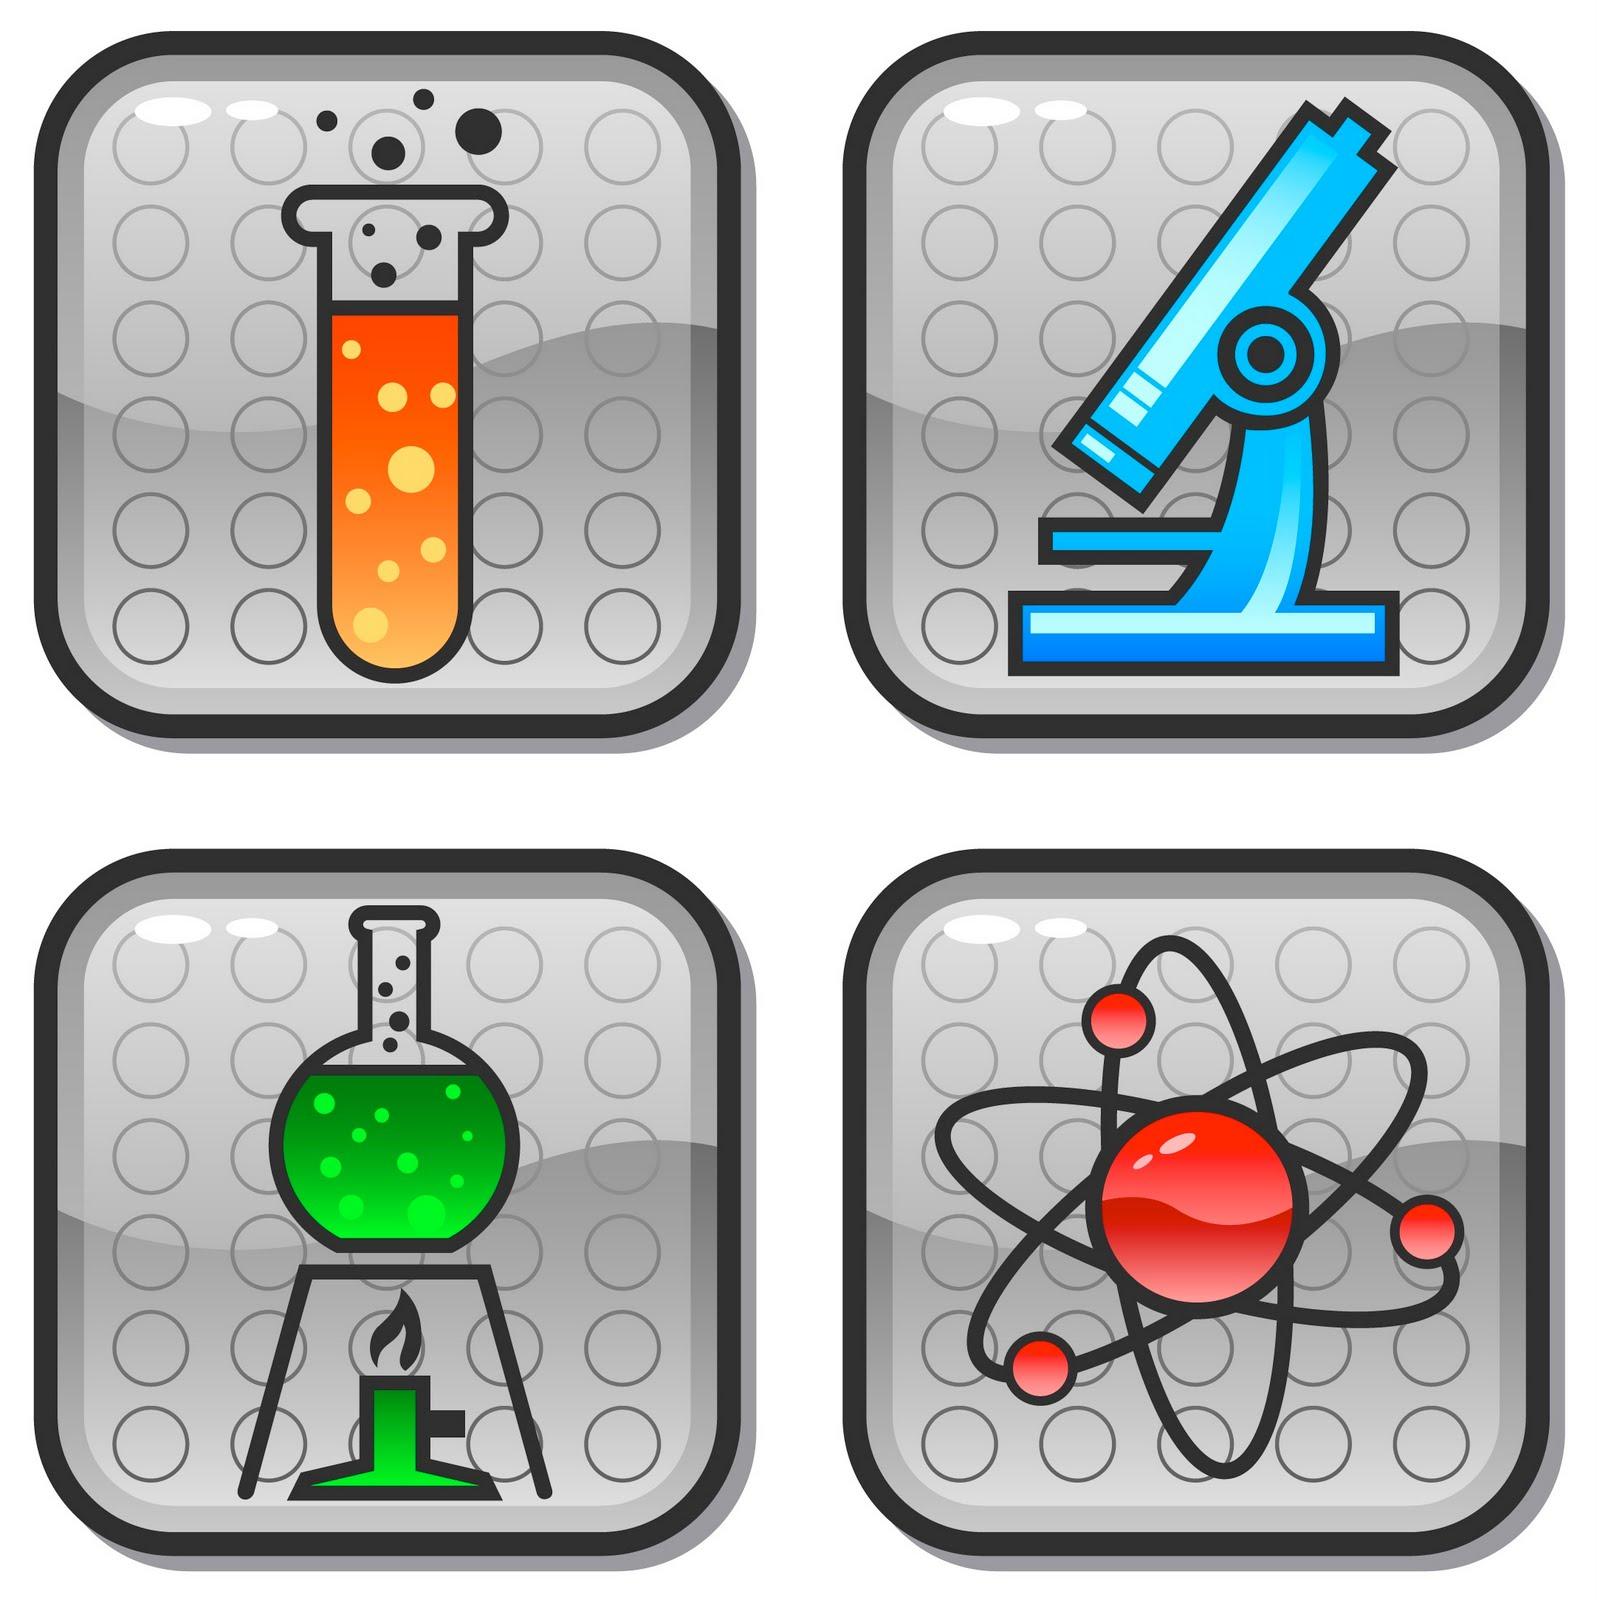 Science clip art borders clipart Science Clip Art Borders | Clipart Panda - Free Clipart Images clipart